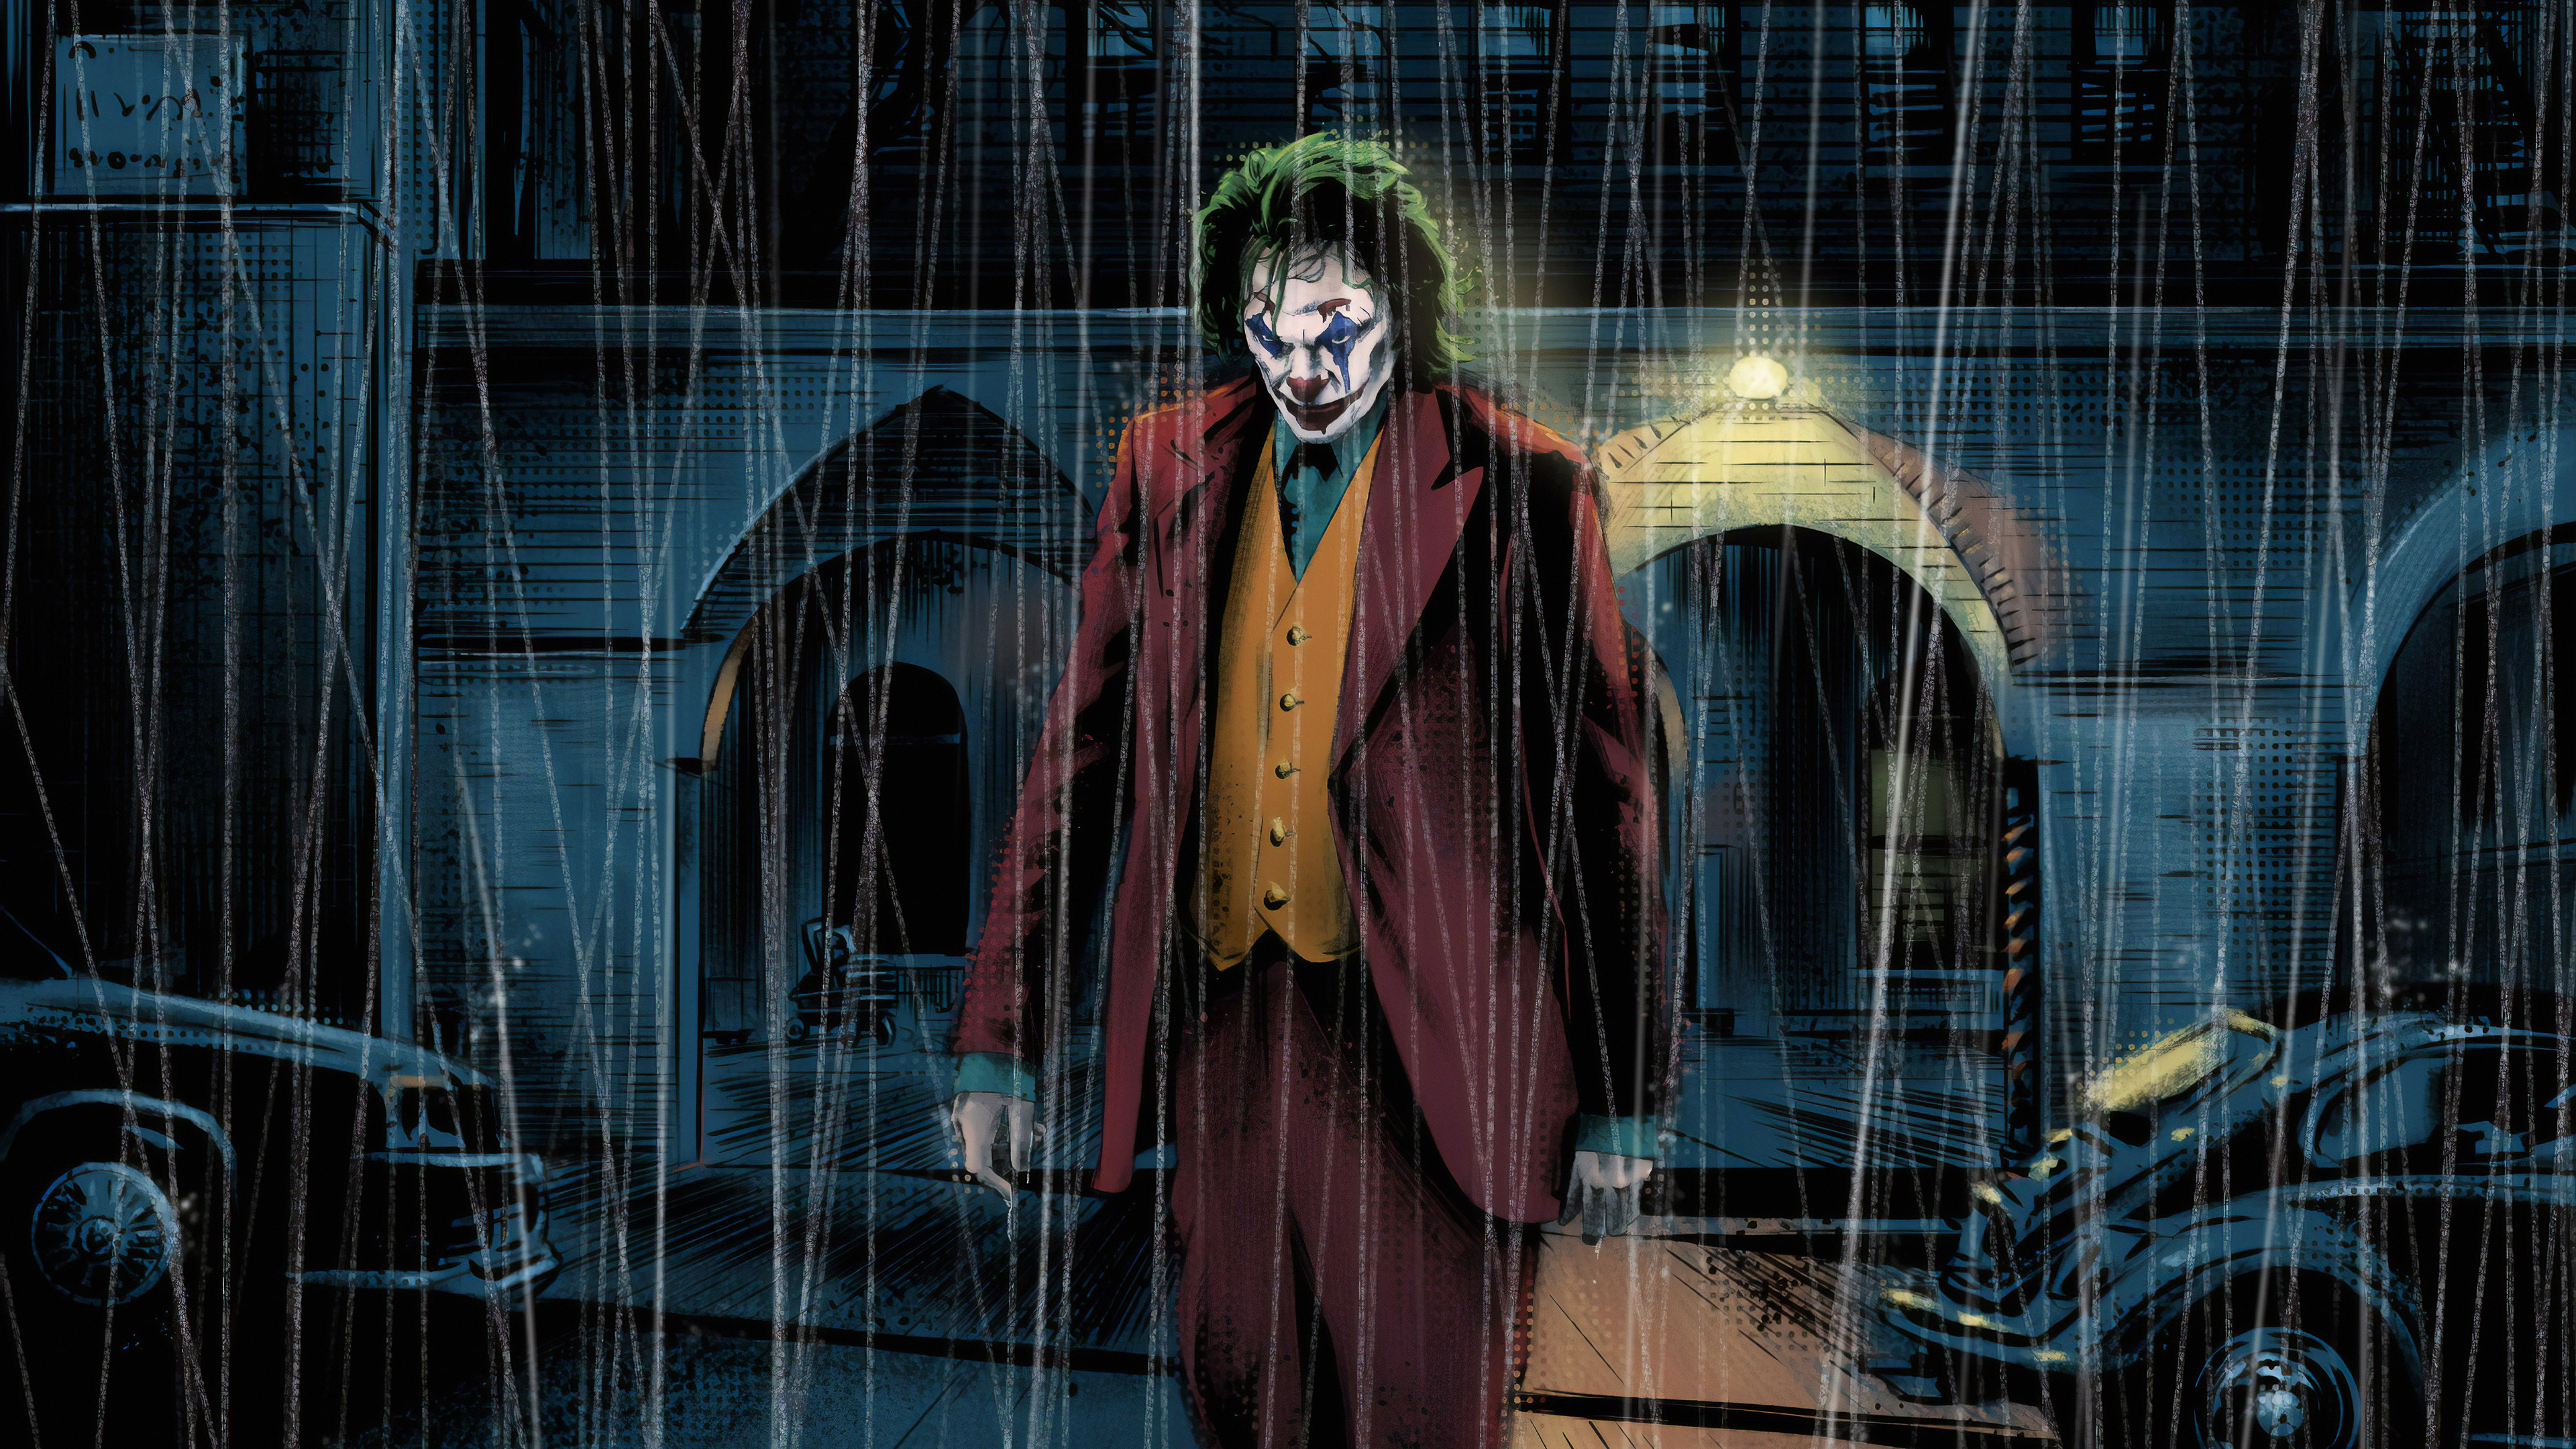 joker art 1572368509 - Joker art - superheroes wallpapers, joker wallpapers, hd-wallpapers, artwork wallpapers, 4k-wallpapers